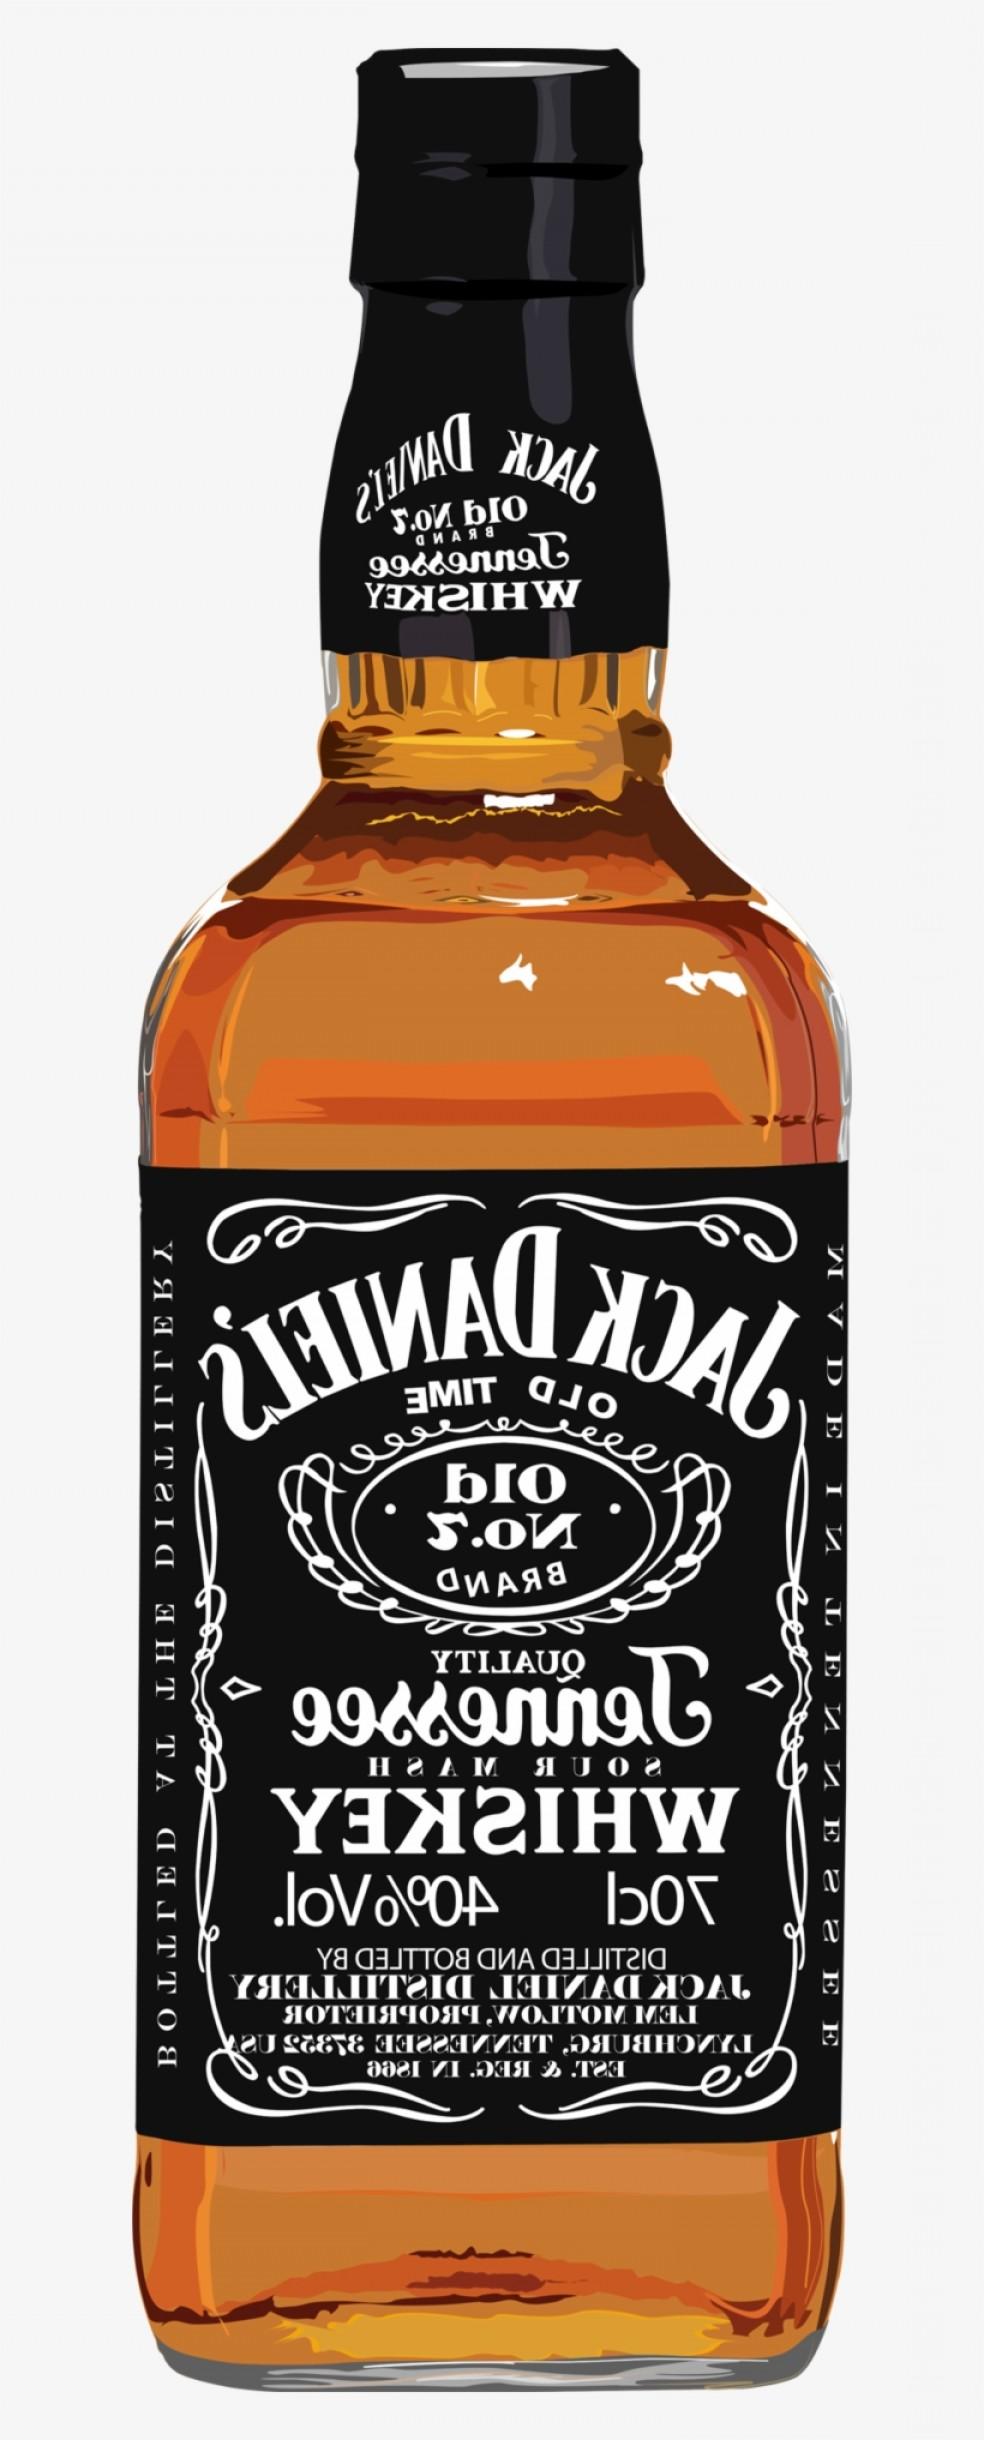 Uqrioeuijack Daniels Ml Jack Daniels Vector Png.